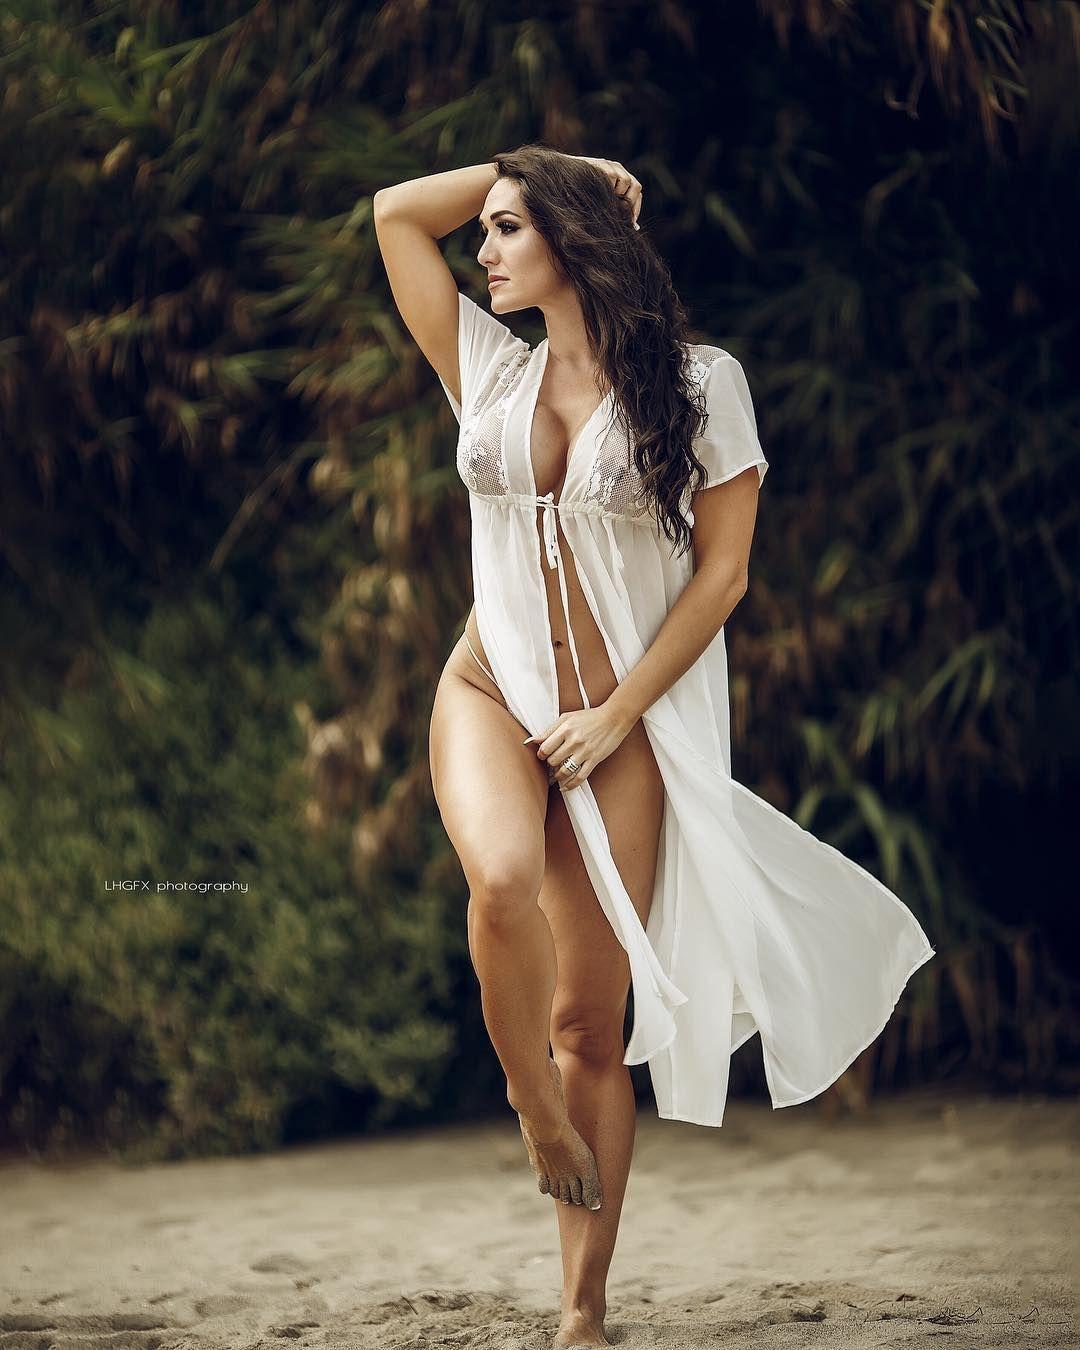 Instagram Gia Marie nudes (67 photos), Tits, Paparazzi, Feet, cleavage 2019